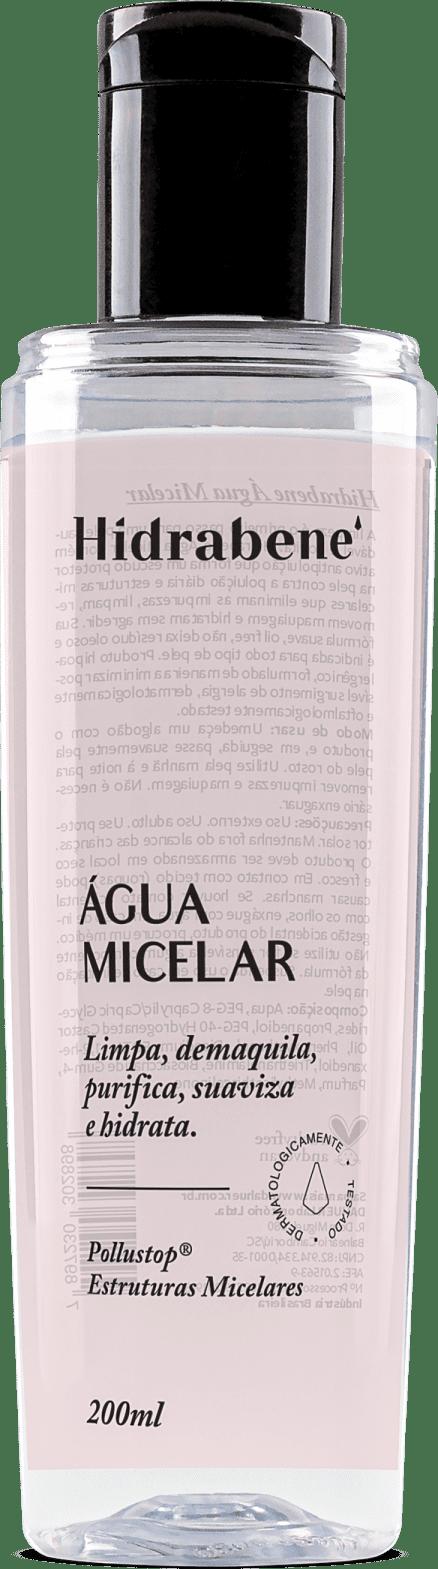 HIDRABENE AGUA MICELAR 200ML